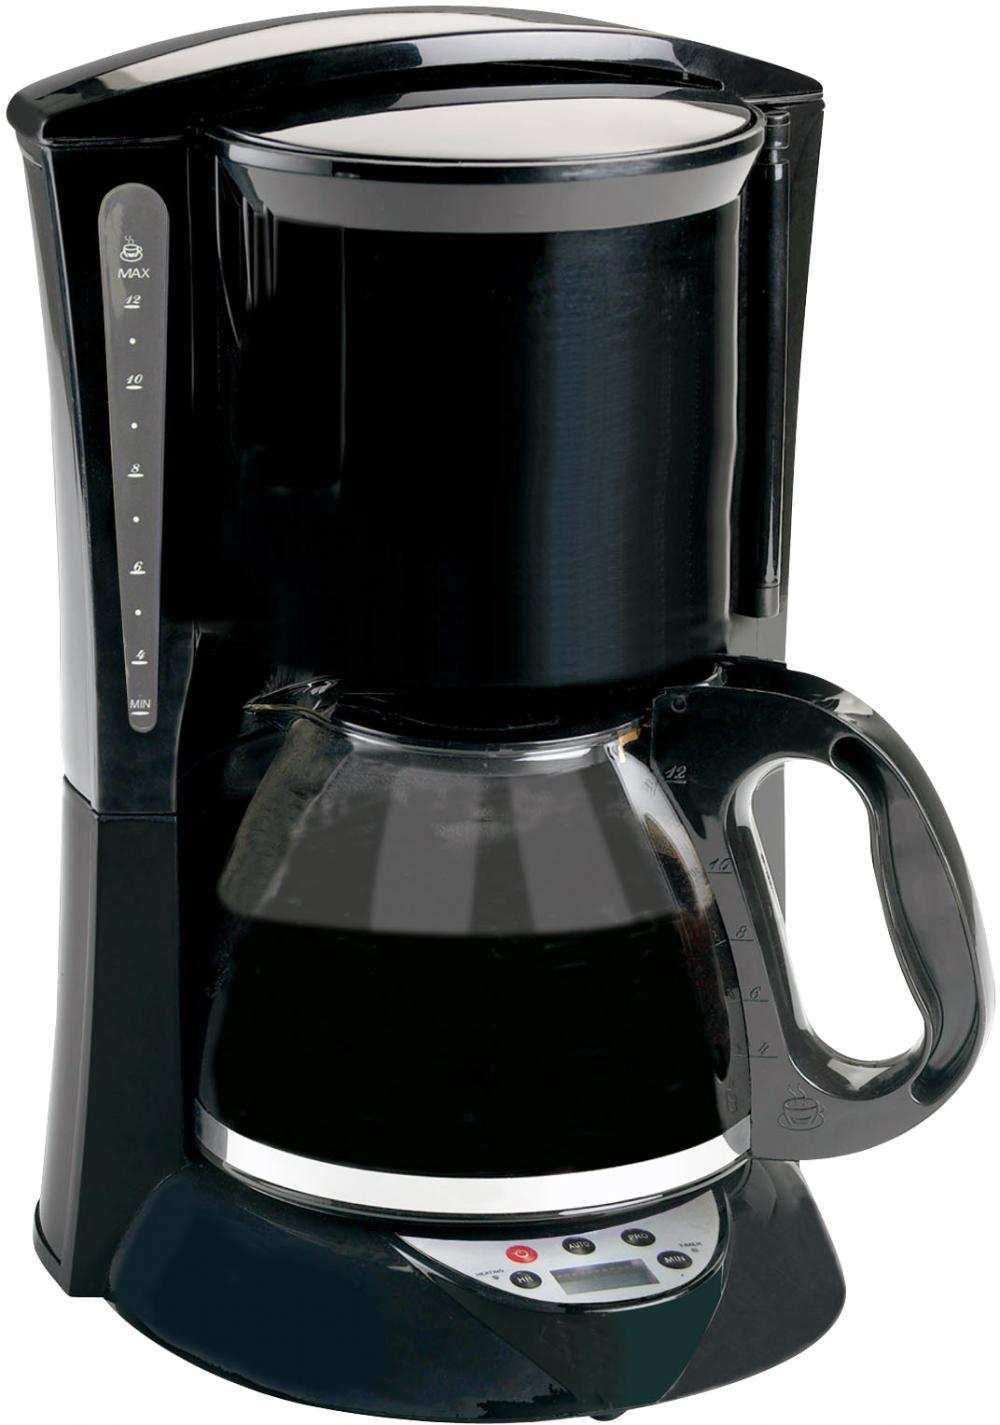 Brentwood Appliances TS-218B 12-Cup Coffee Maker (Black; Digital)